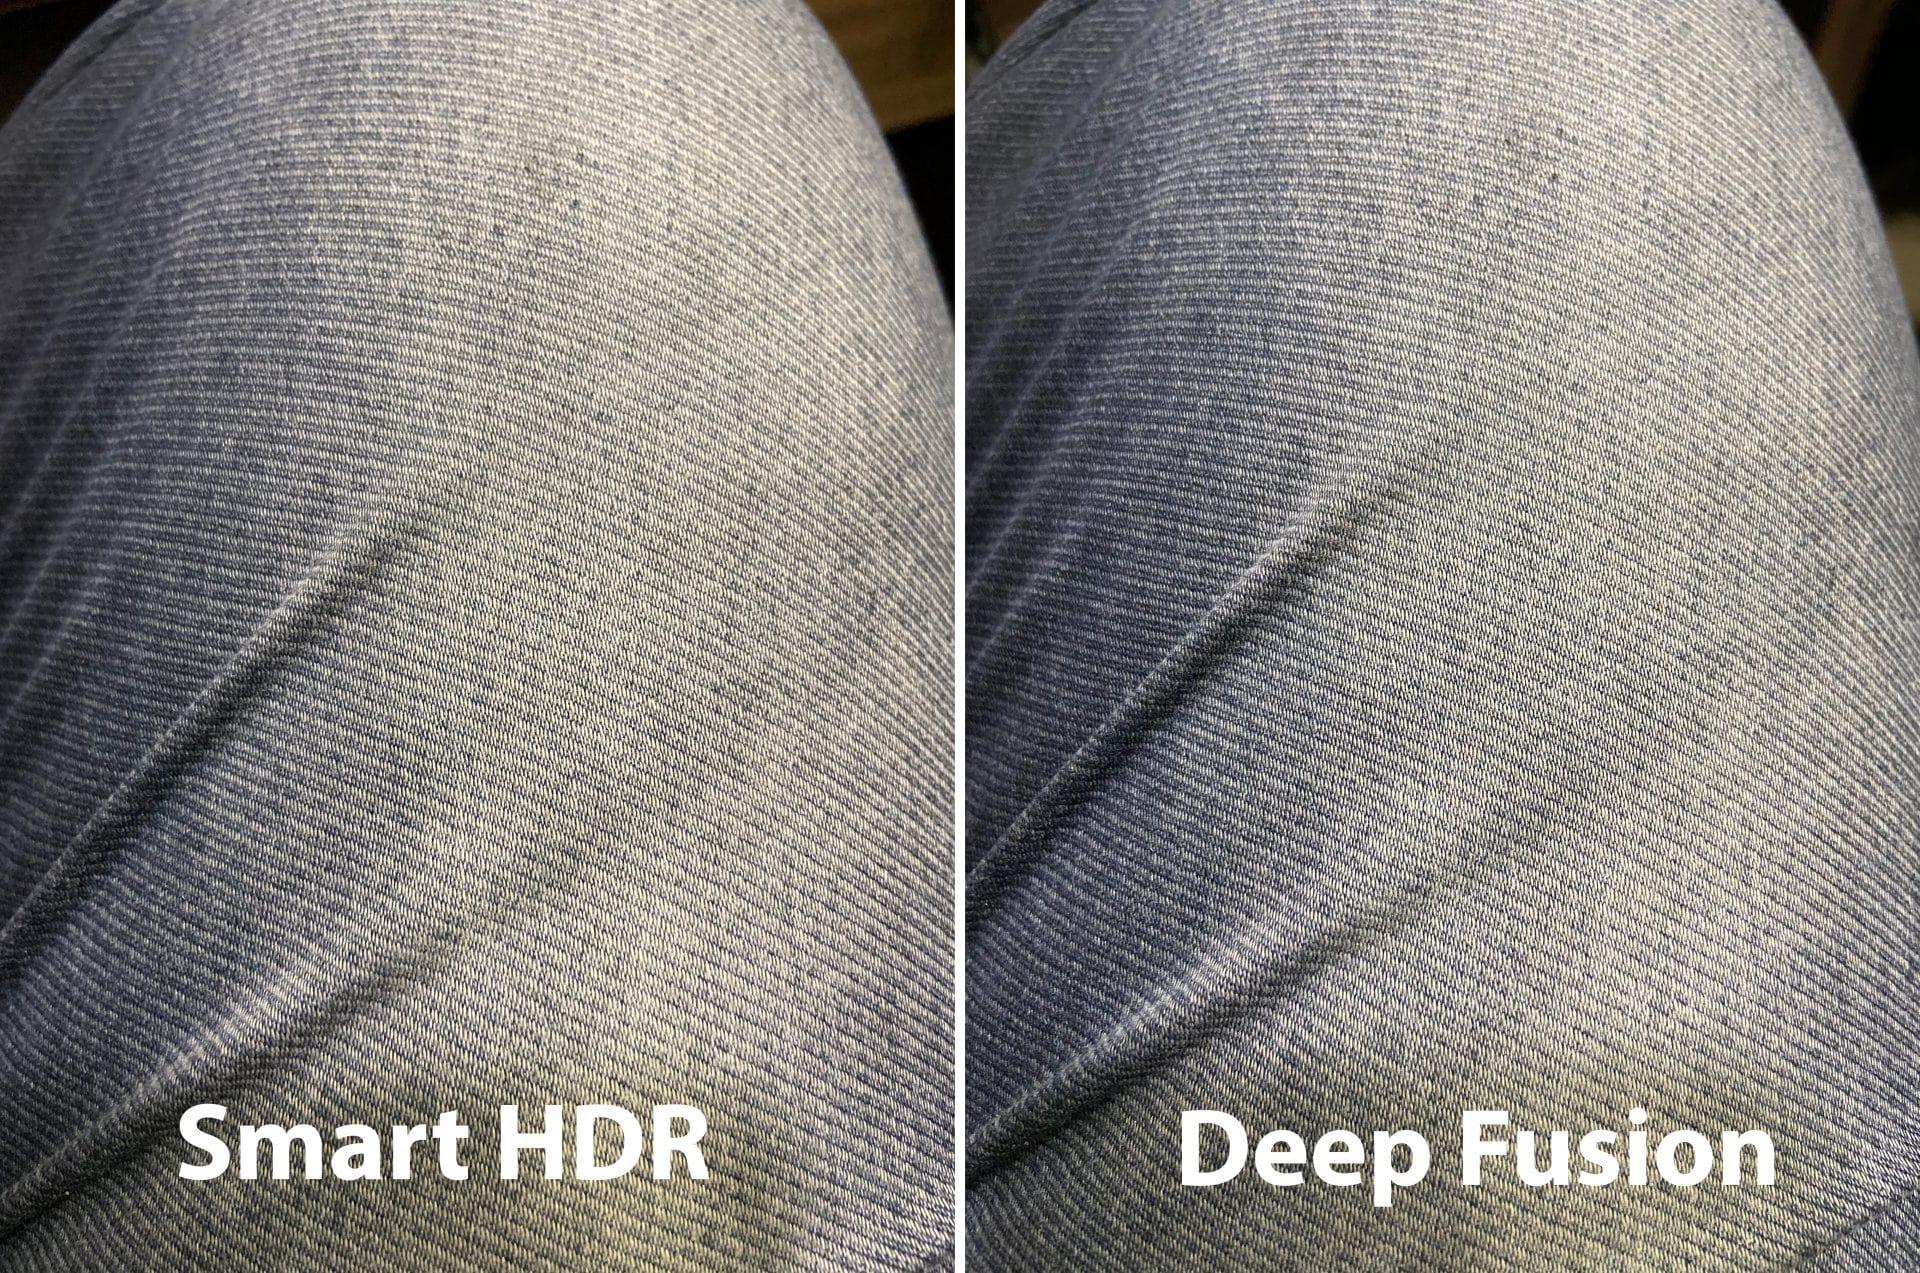 حالت دیپ فیوژن و smart HDR